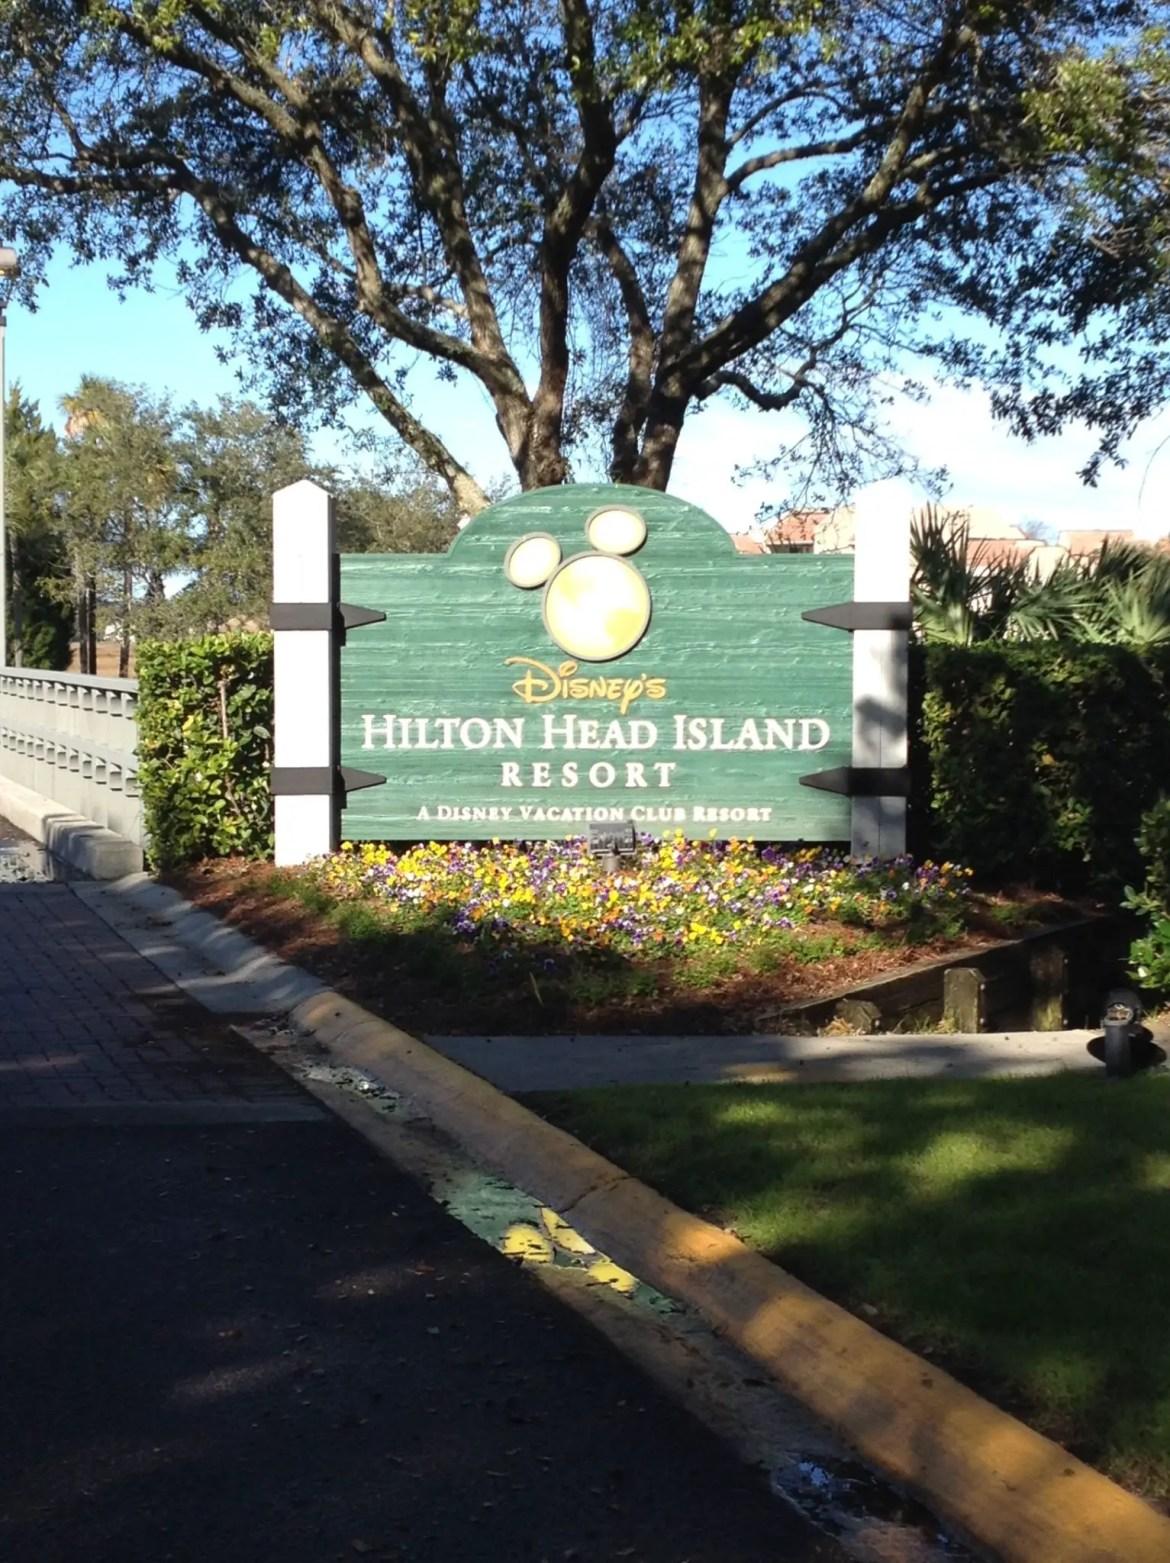 Disney's Hilton Head Island Resort Reopens after Hurricane Florence